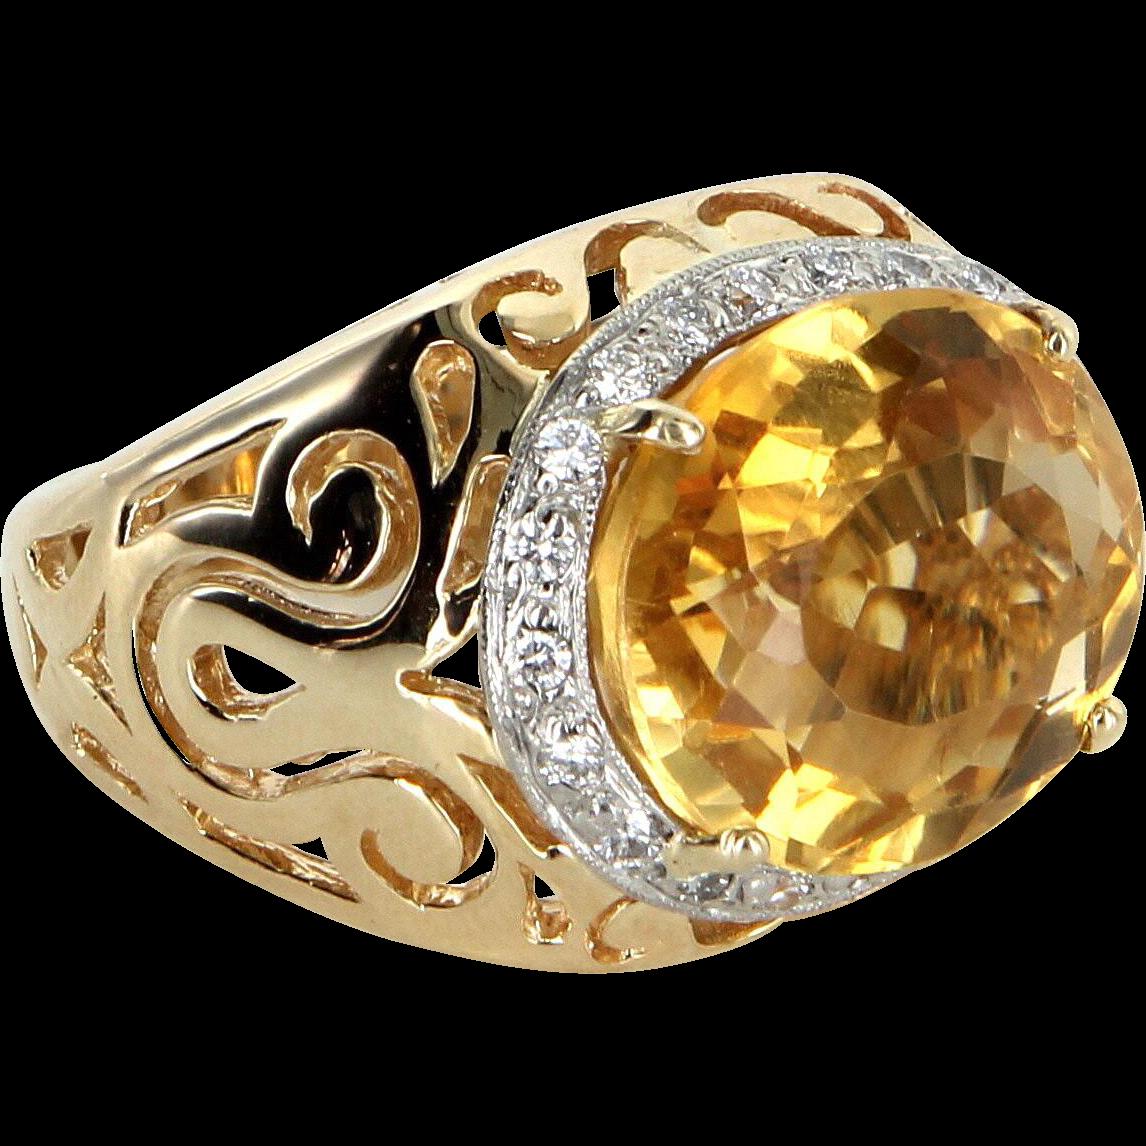 Large East West Citrine Diamond Cocktail Ring Vintage 14 Karat Yellow Gold Estate